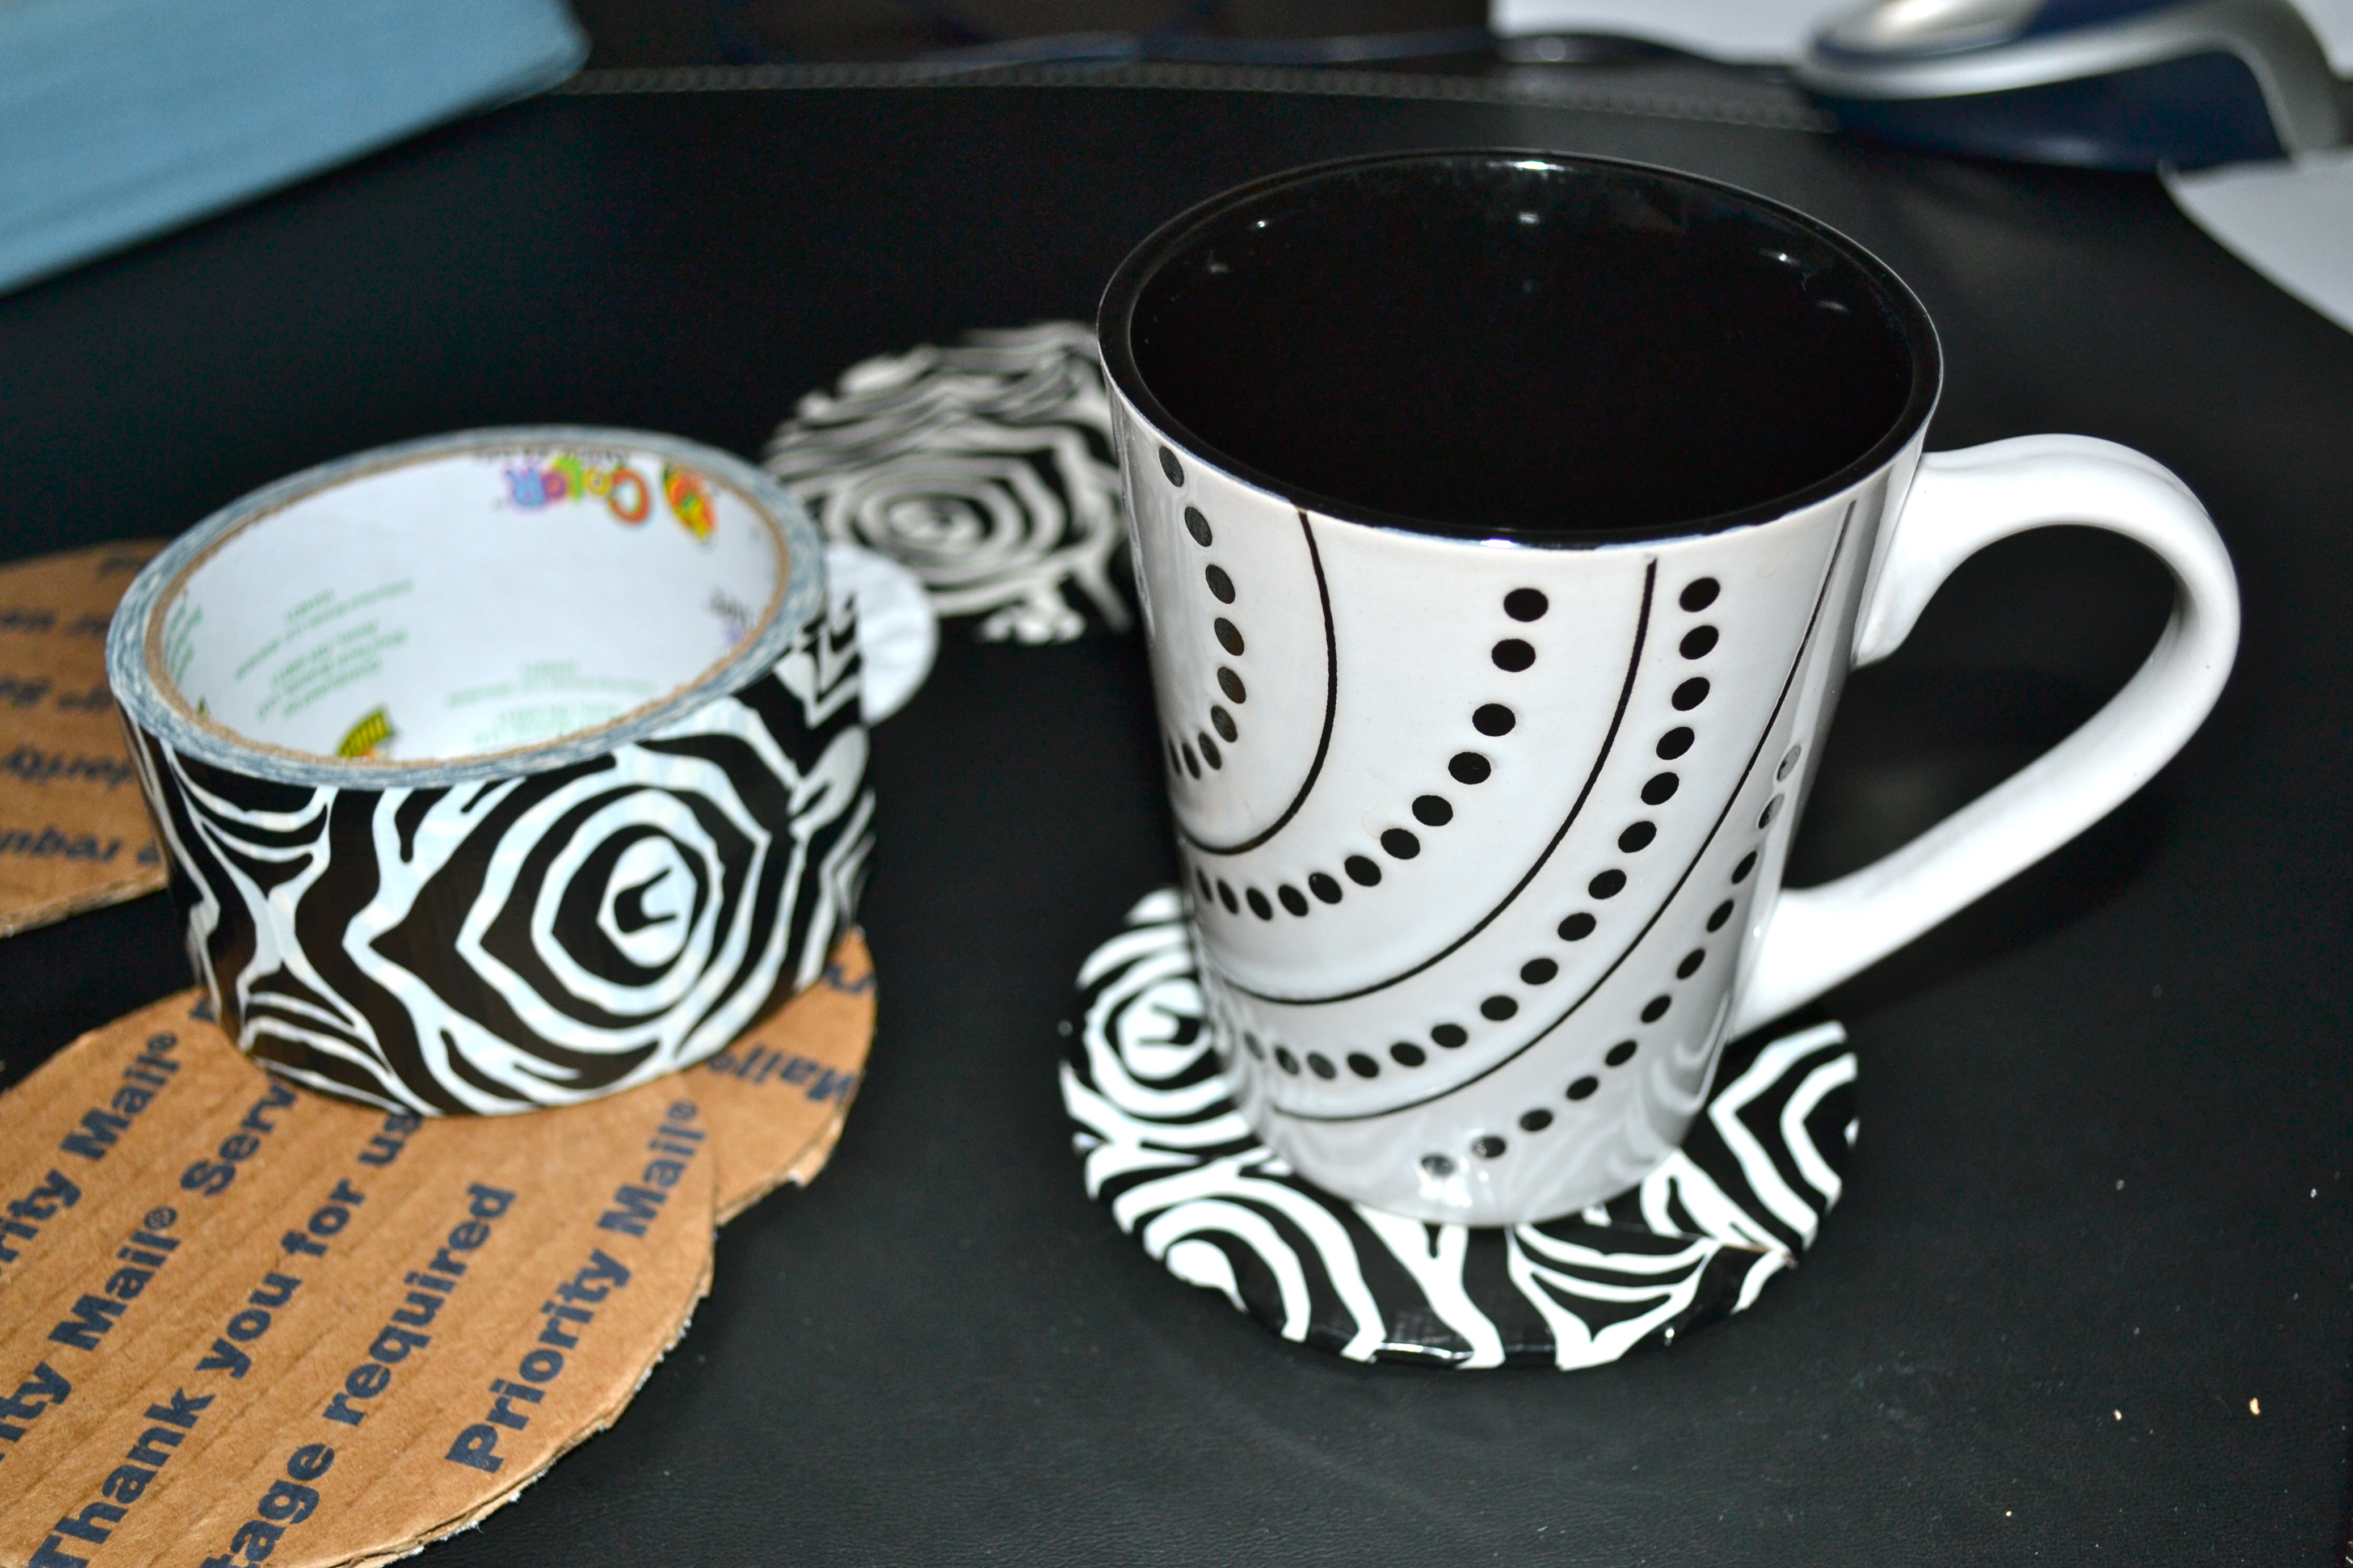 DIY coasters from cardboard